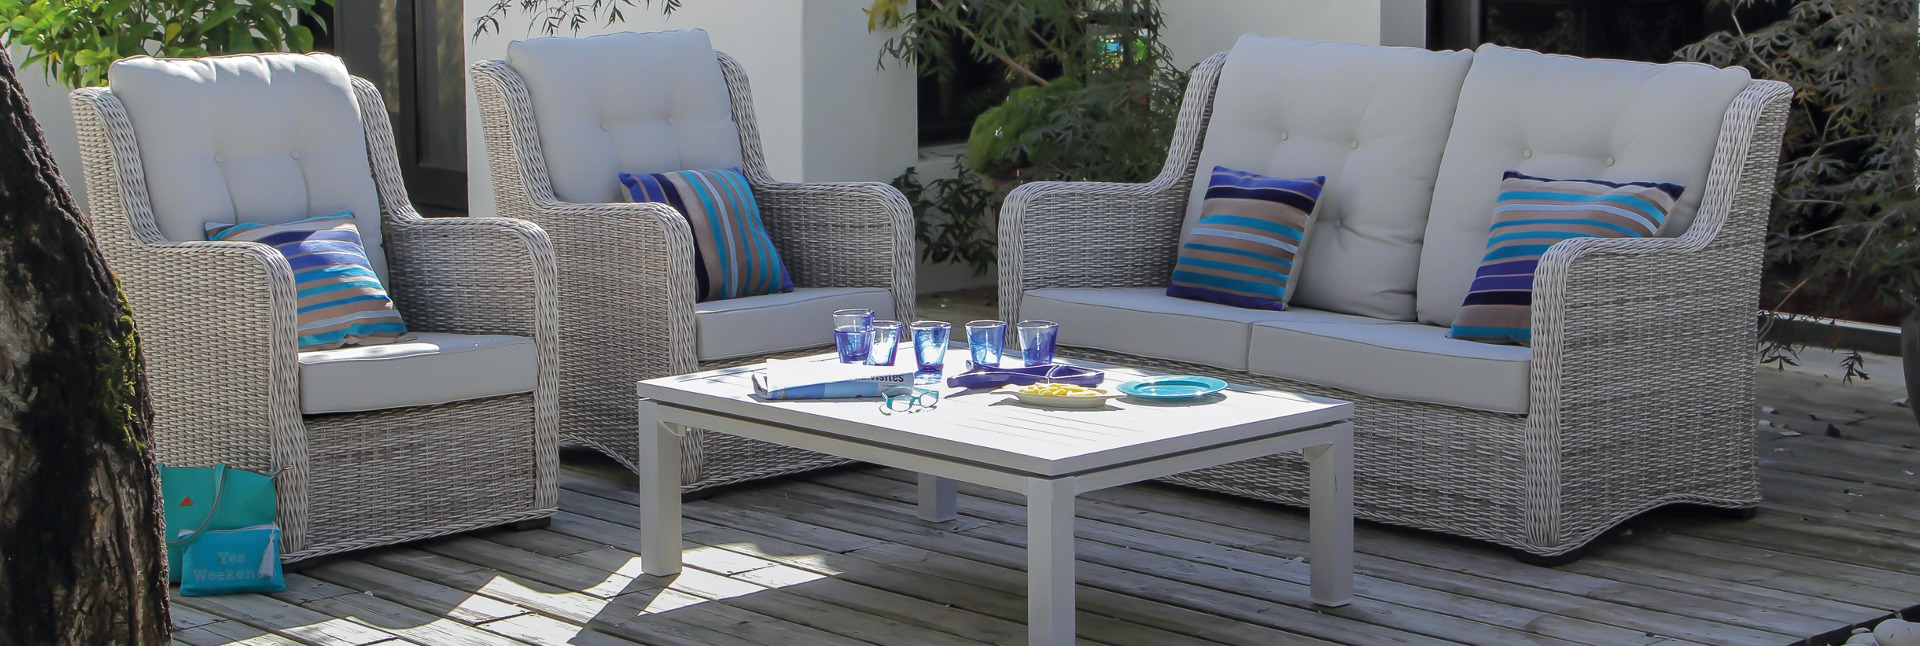 oc o sp cialiste du mobilier de jardin haut de gamme. Black Bedroom Furniture Sets. Home Design Ideas